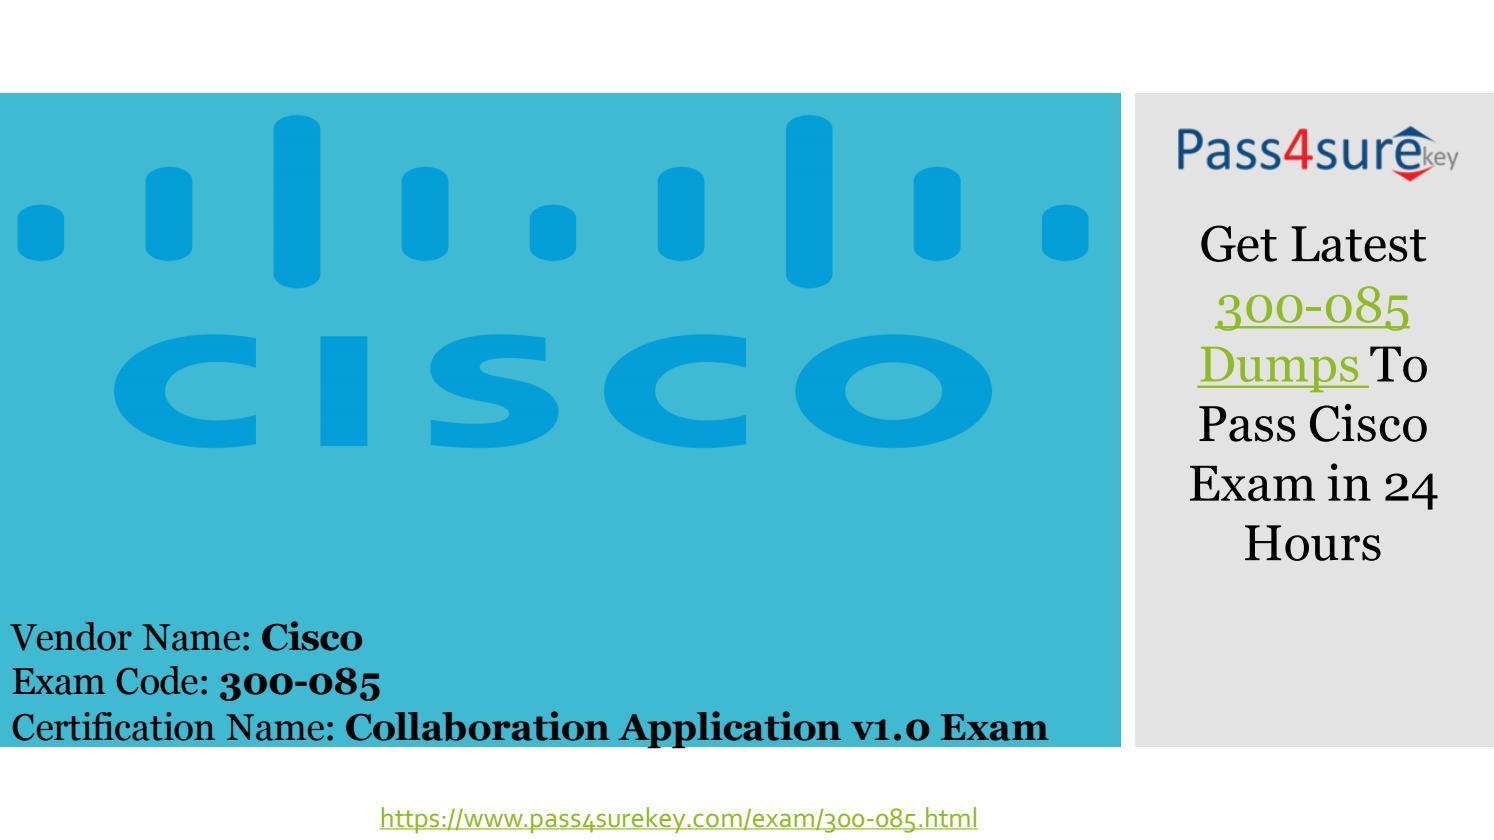 Latest Cisco 300 085 Dumps Pdf 300 085 Exam Questions By Amma Jhon